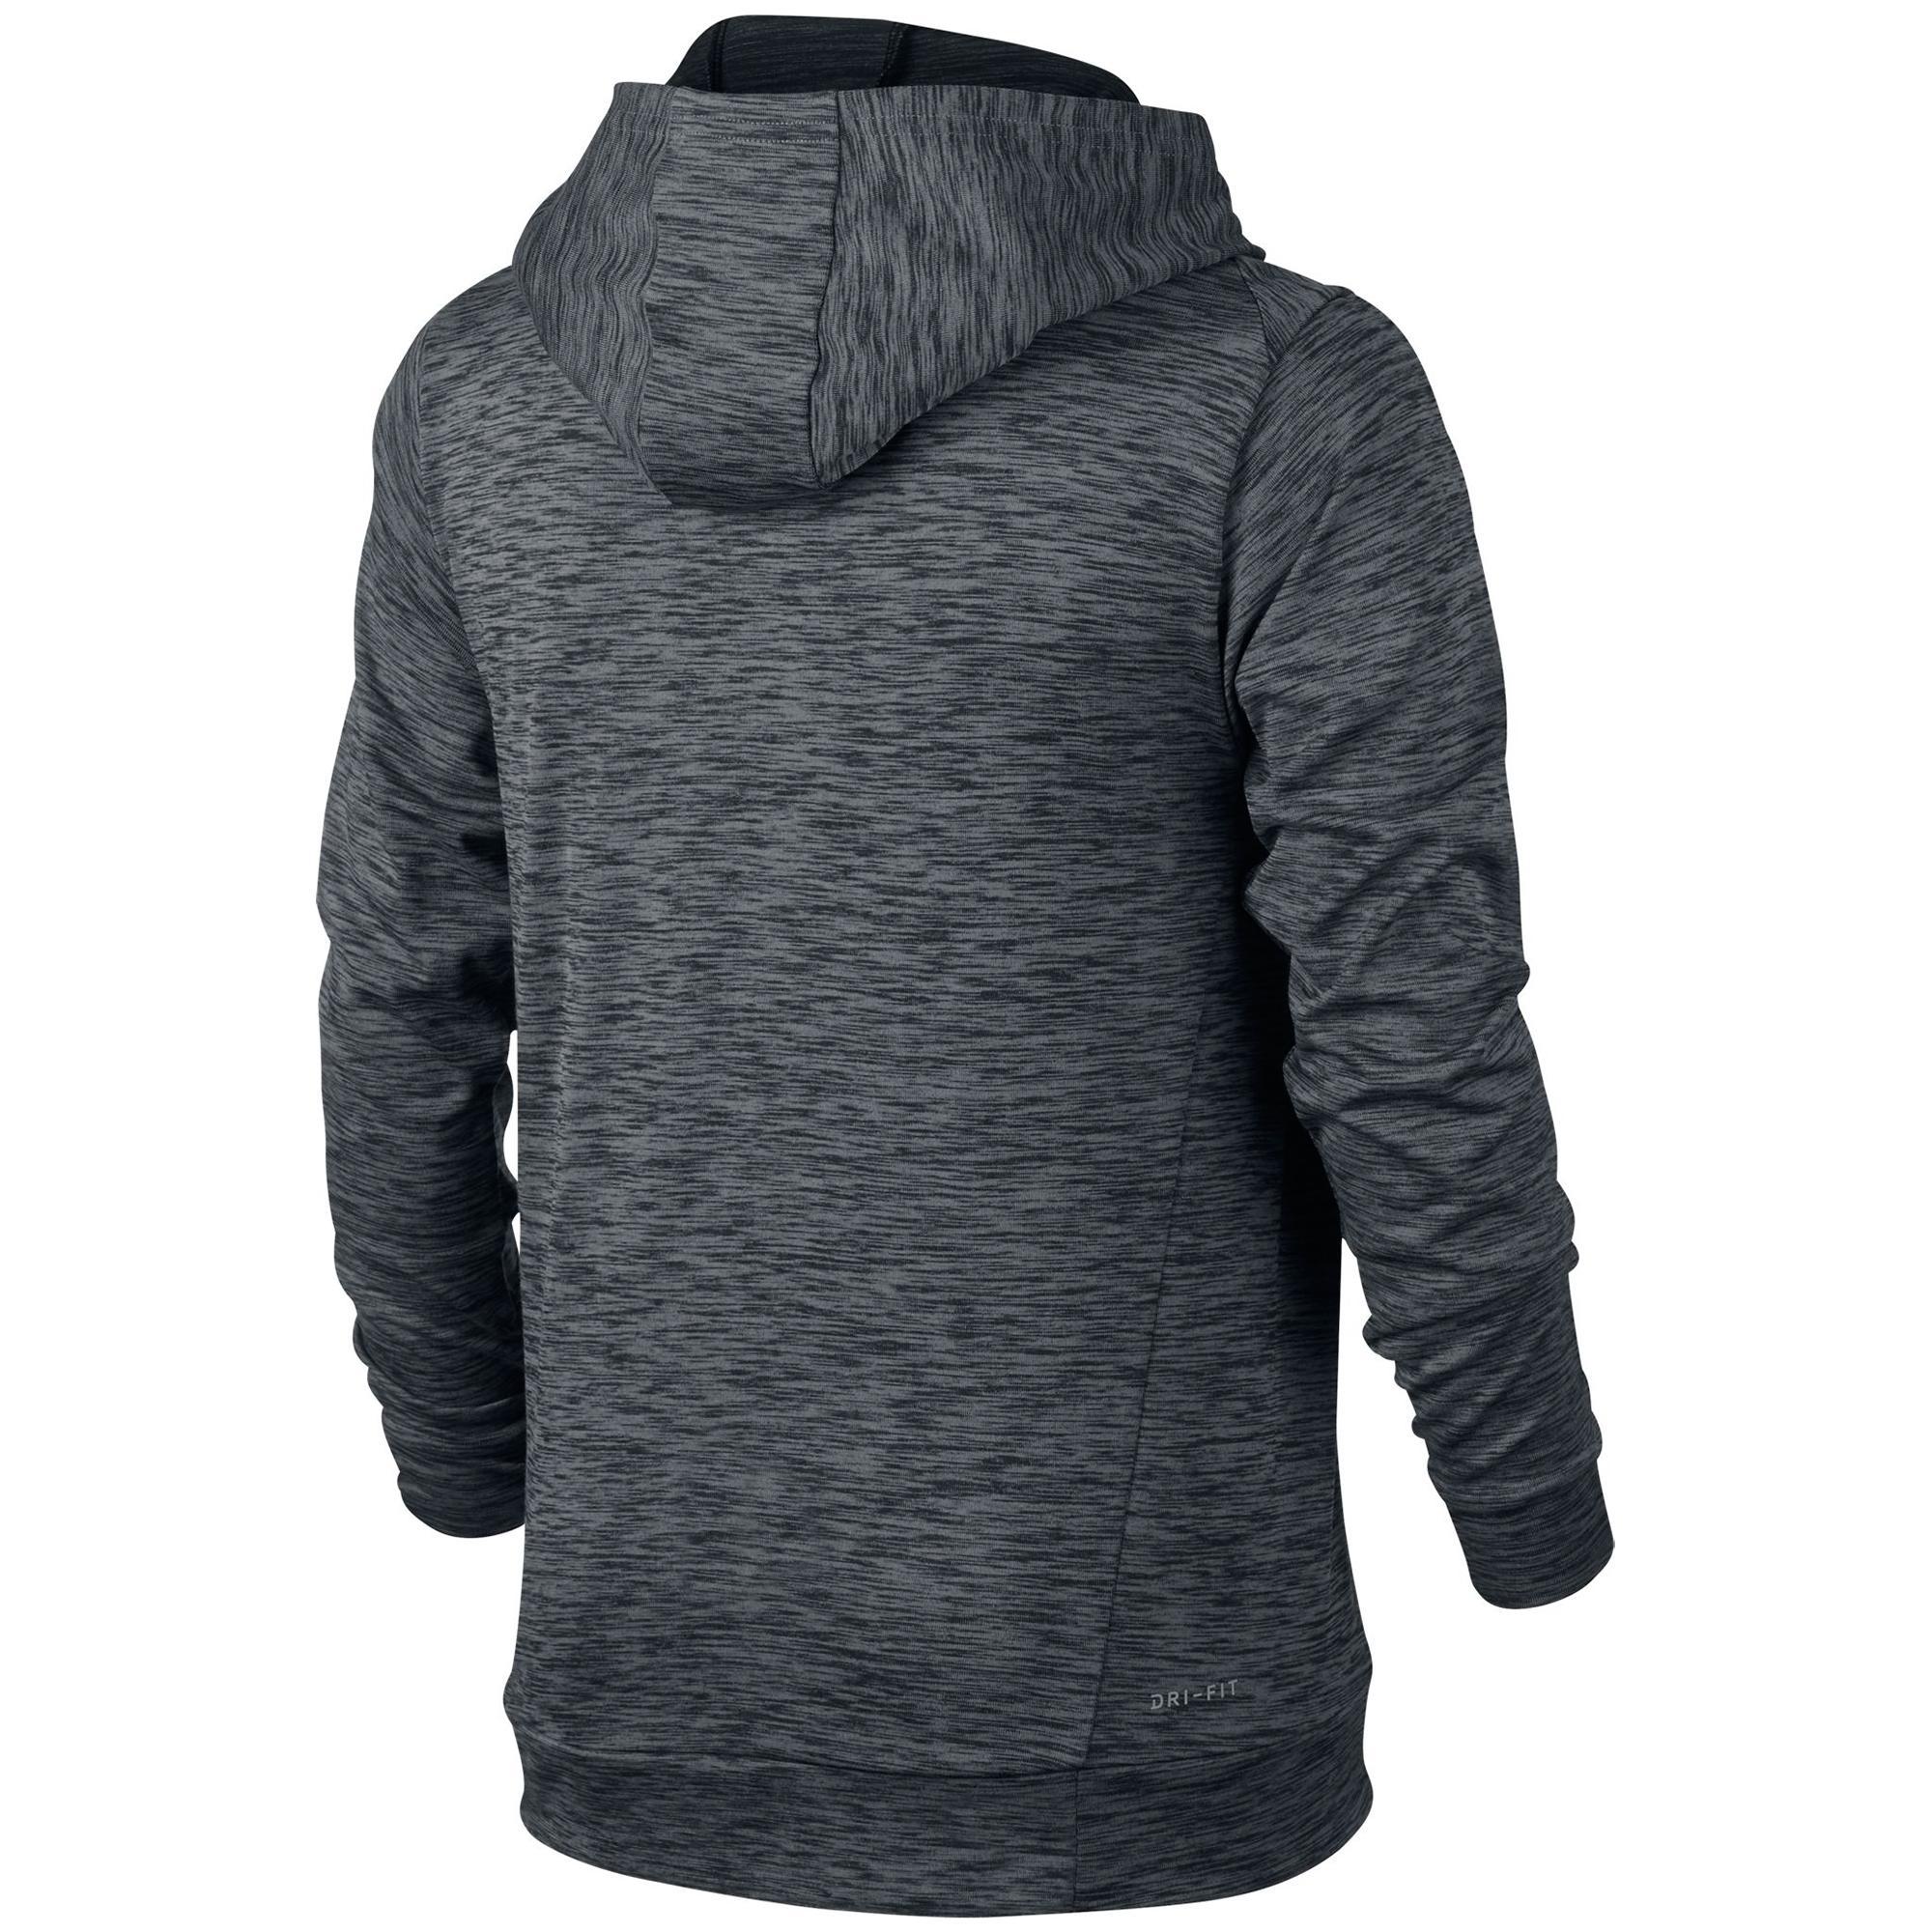 40a322c0bc9c Nike Boys Dry Training Hoodie - Black Wolf Grey - Tennisnuts.com